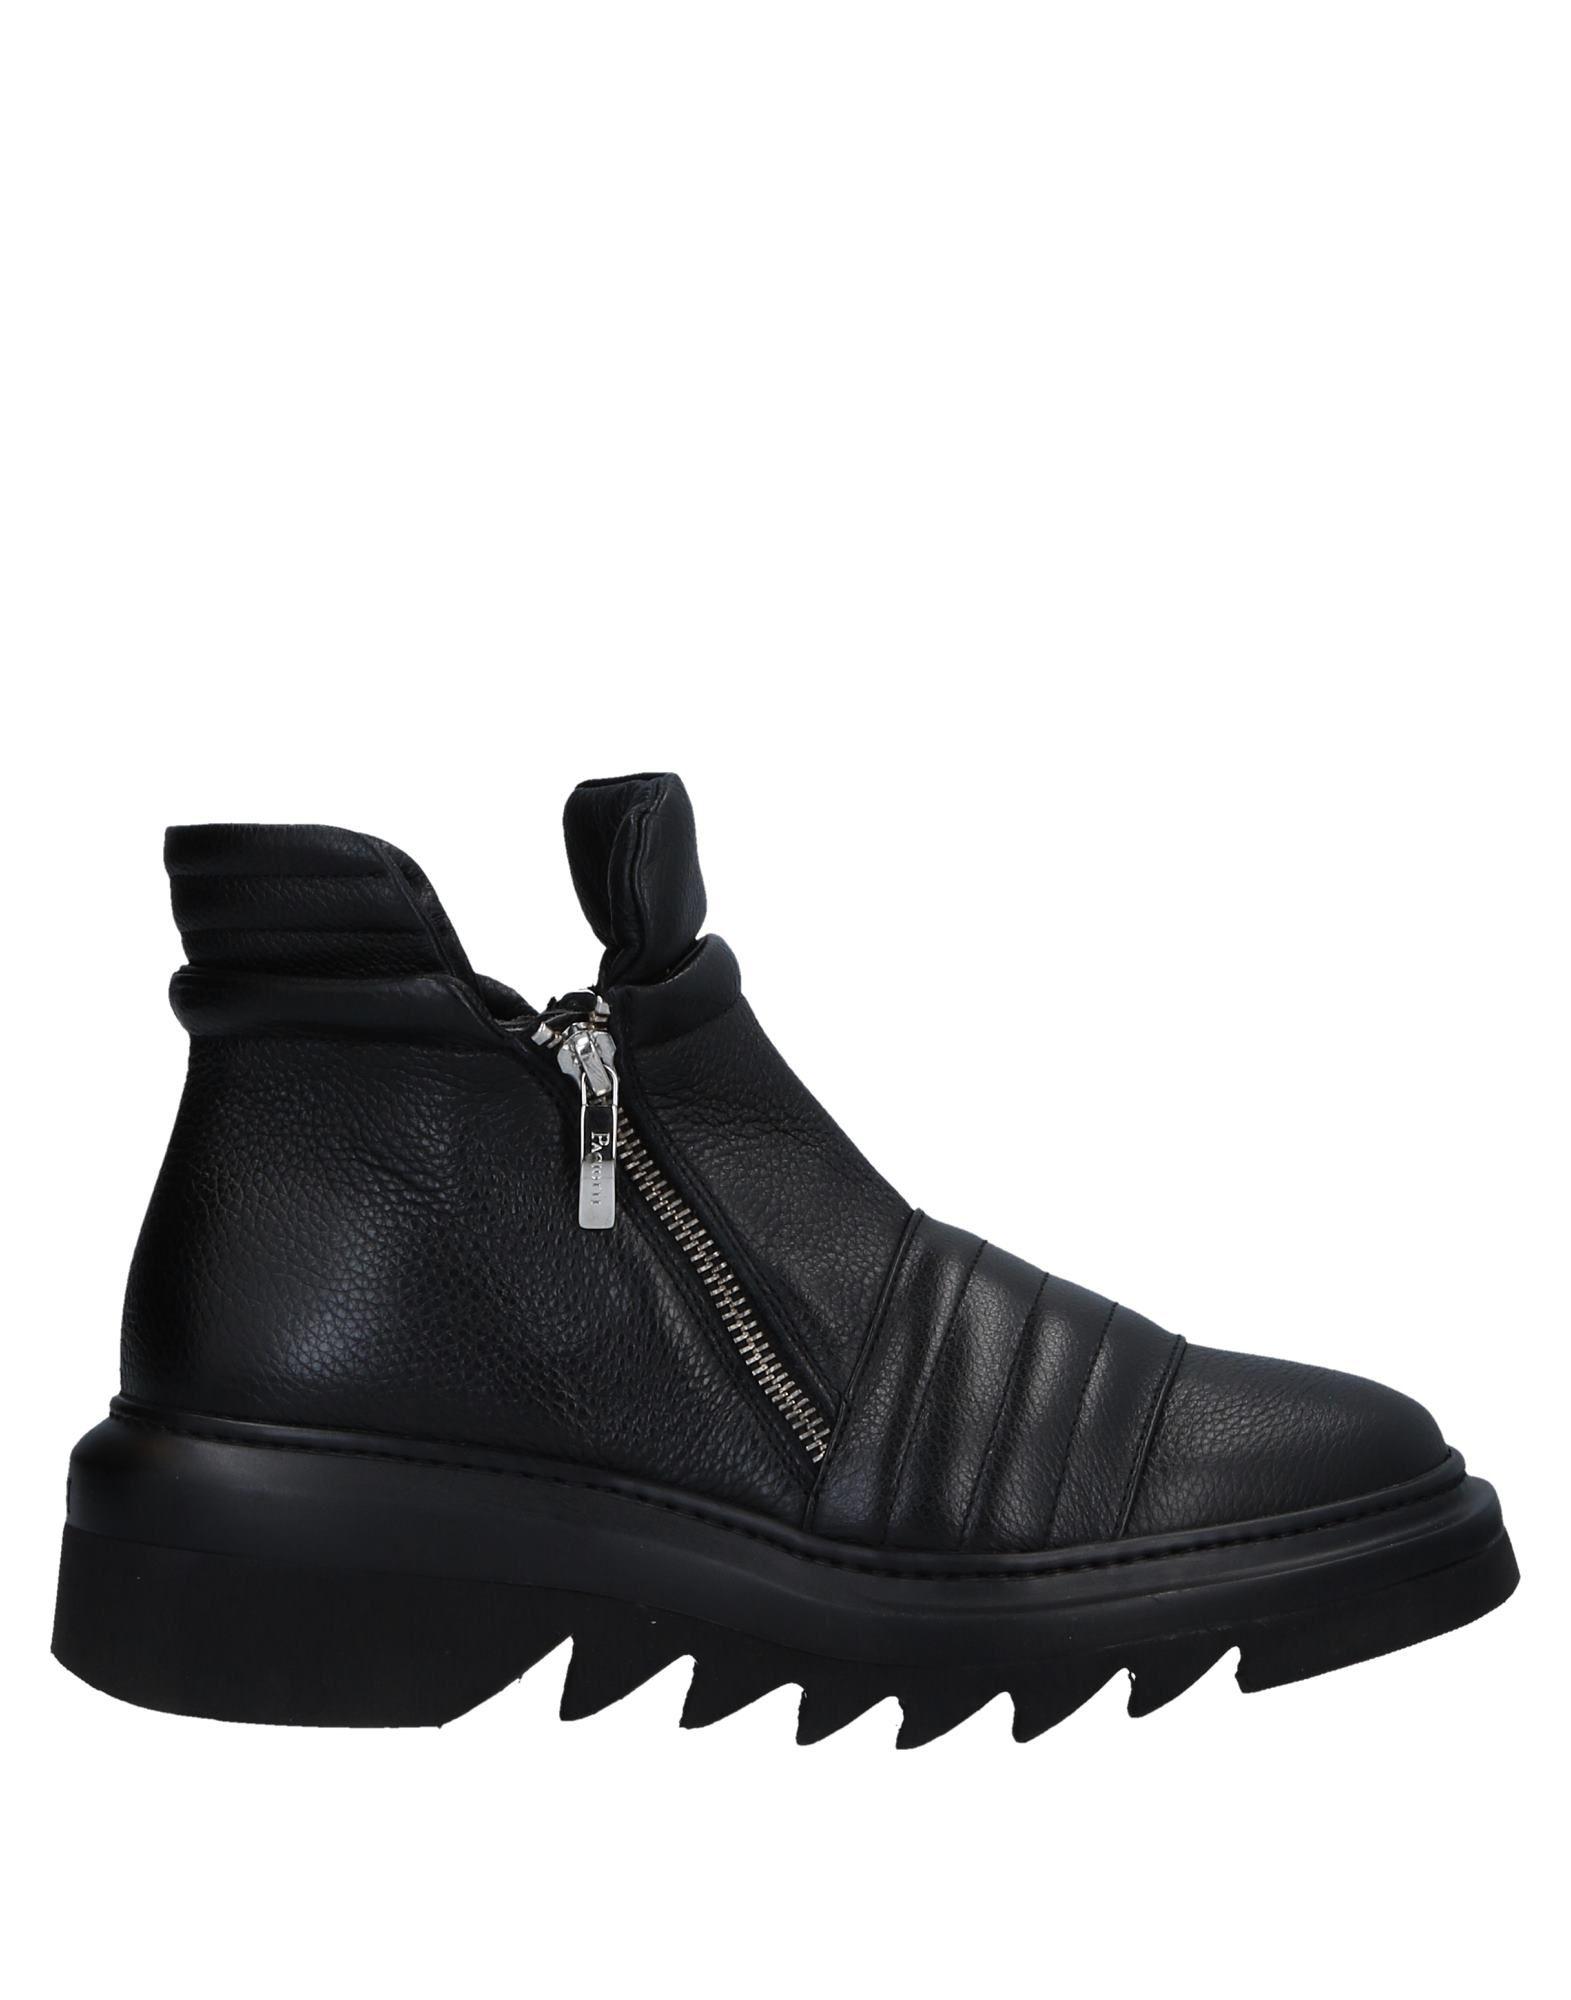 Cesare Paciotti 4Us 4Us 4Us Stiefelette Damen  11515228XQ Neue Schuhe 3783d3